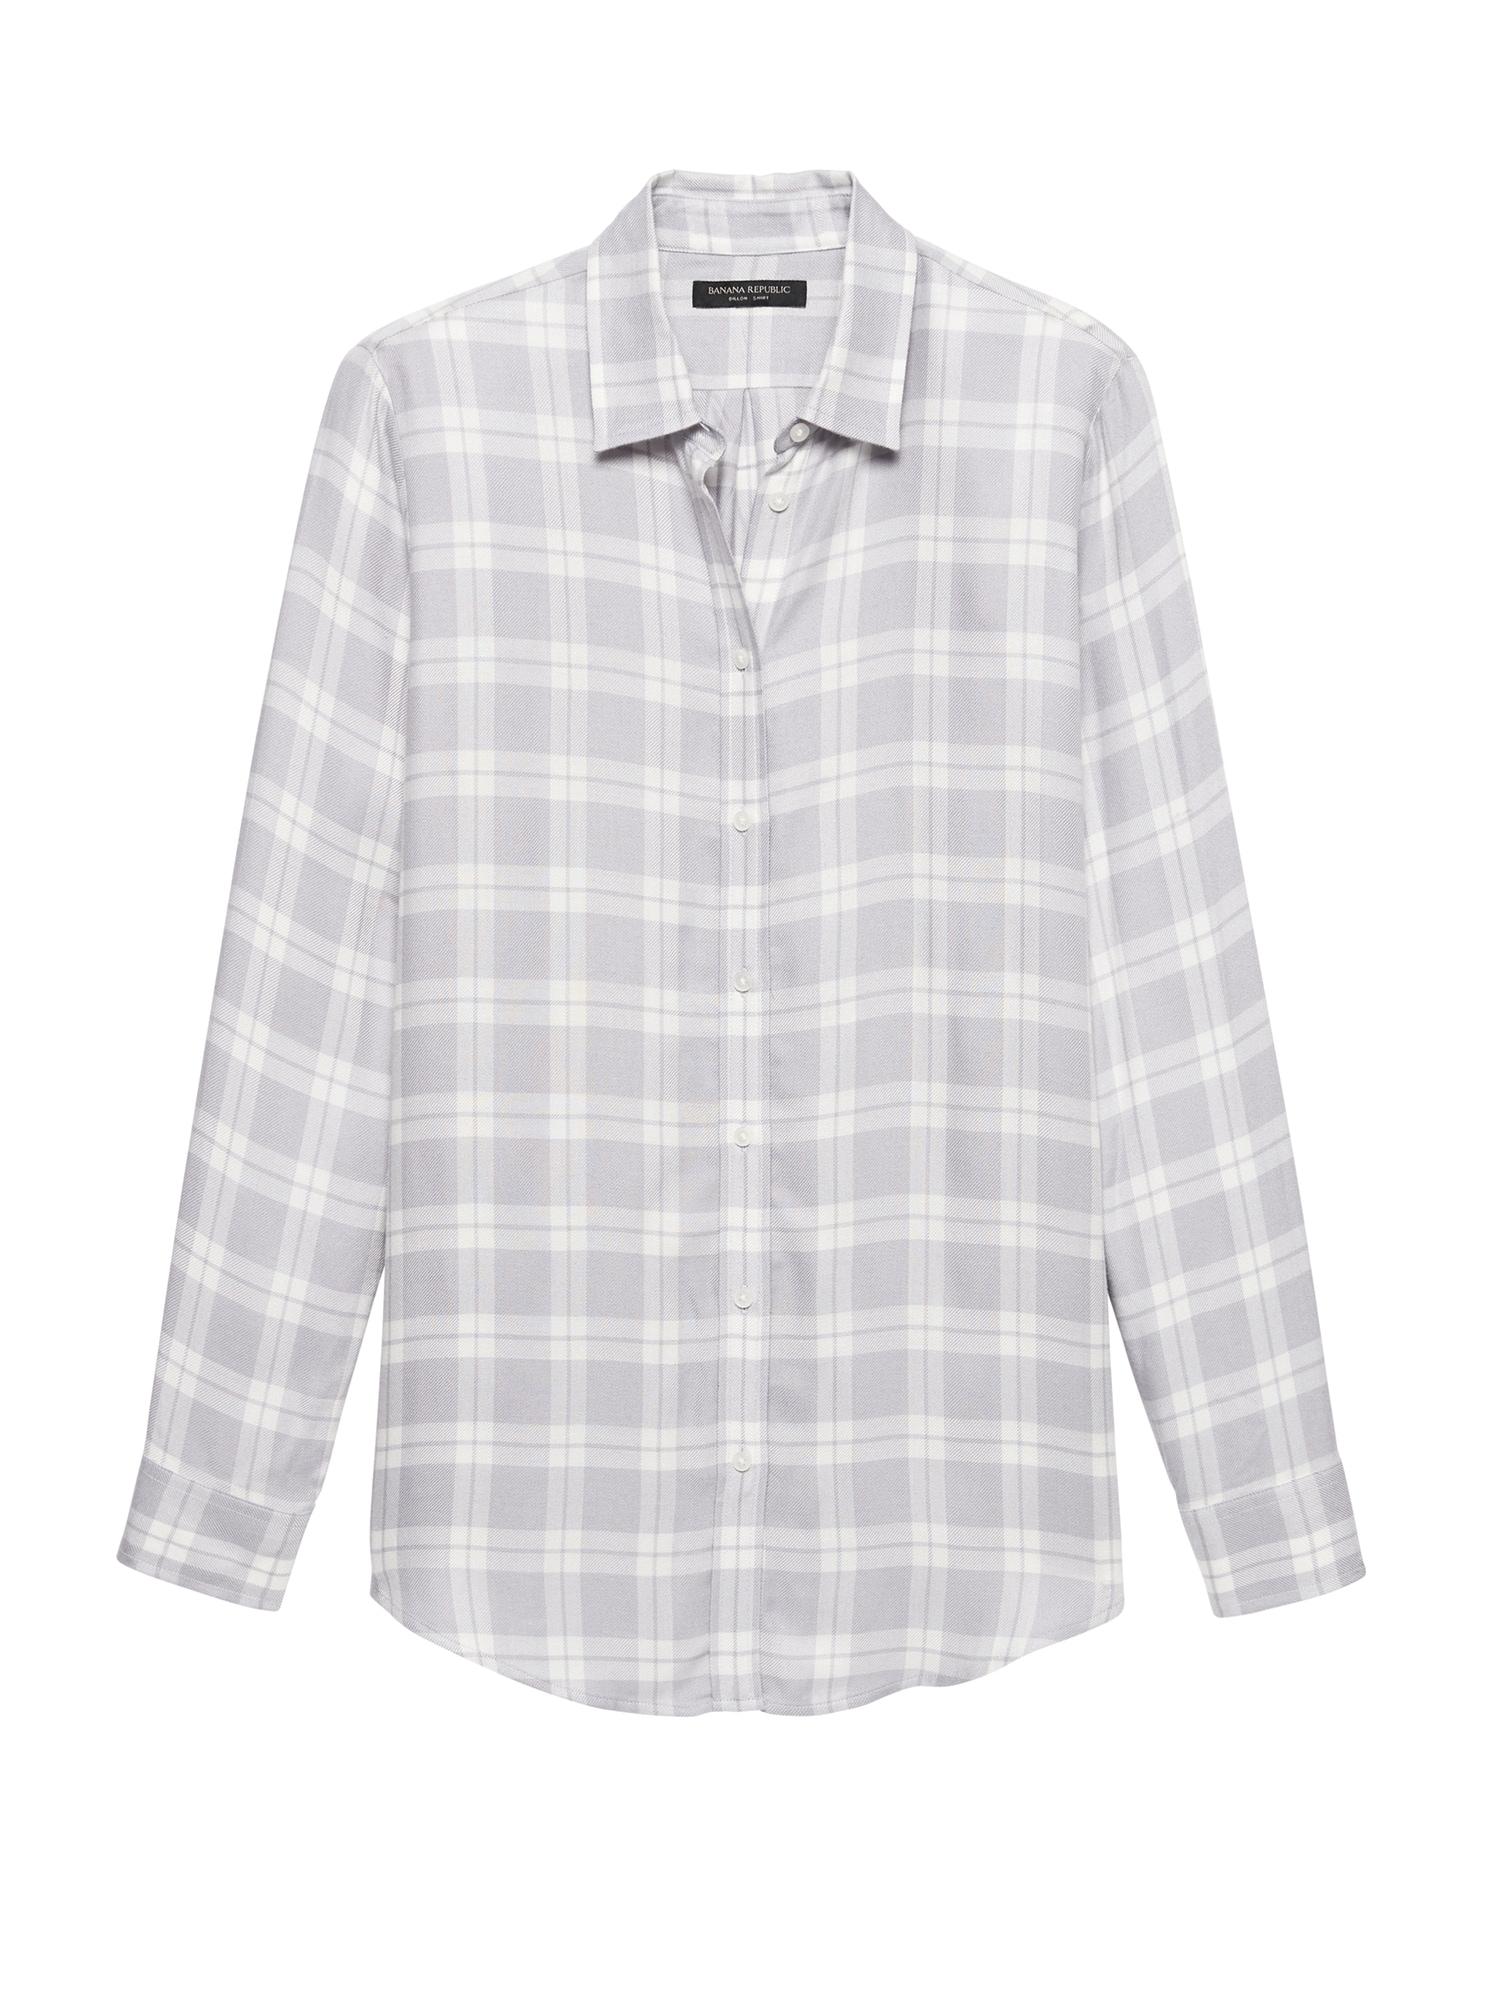 1bfab0dabbb Dillon Classic-Fit Plaid Flannel Shirt | Banana Republic